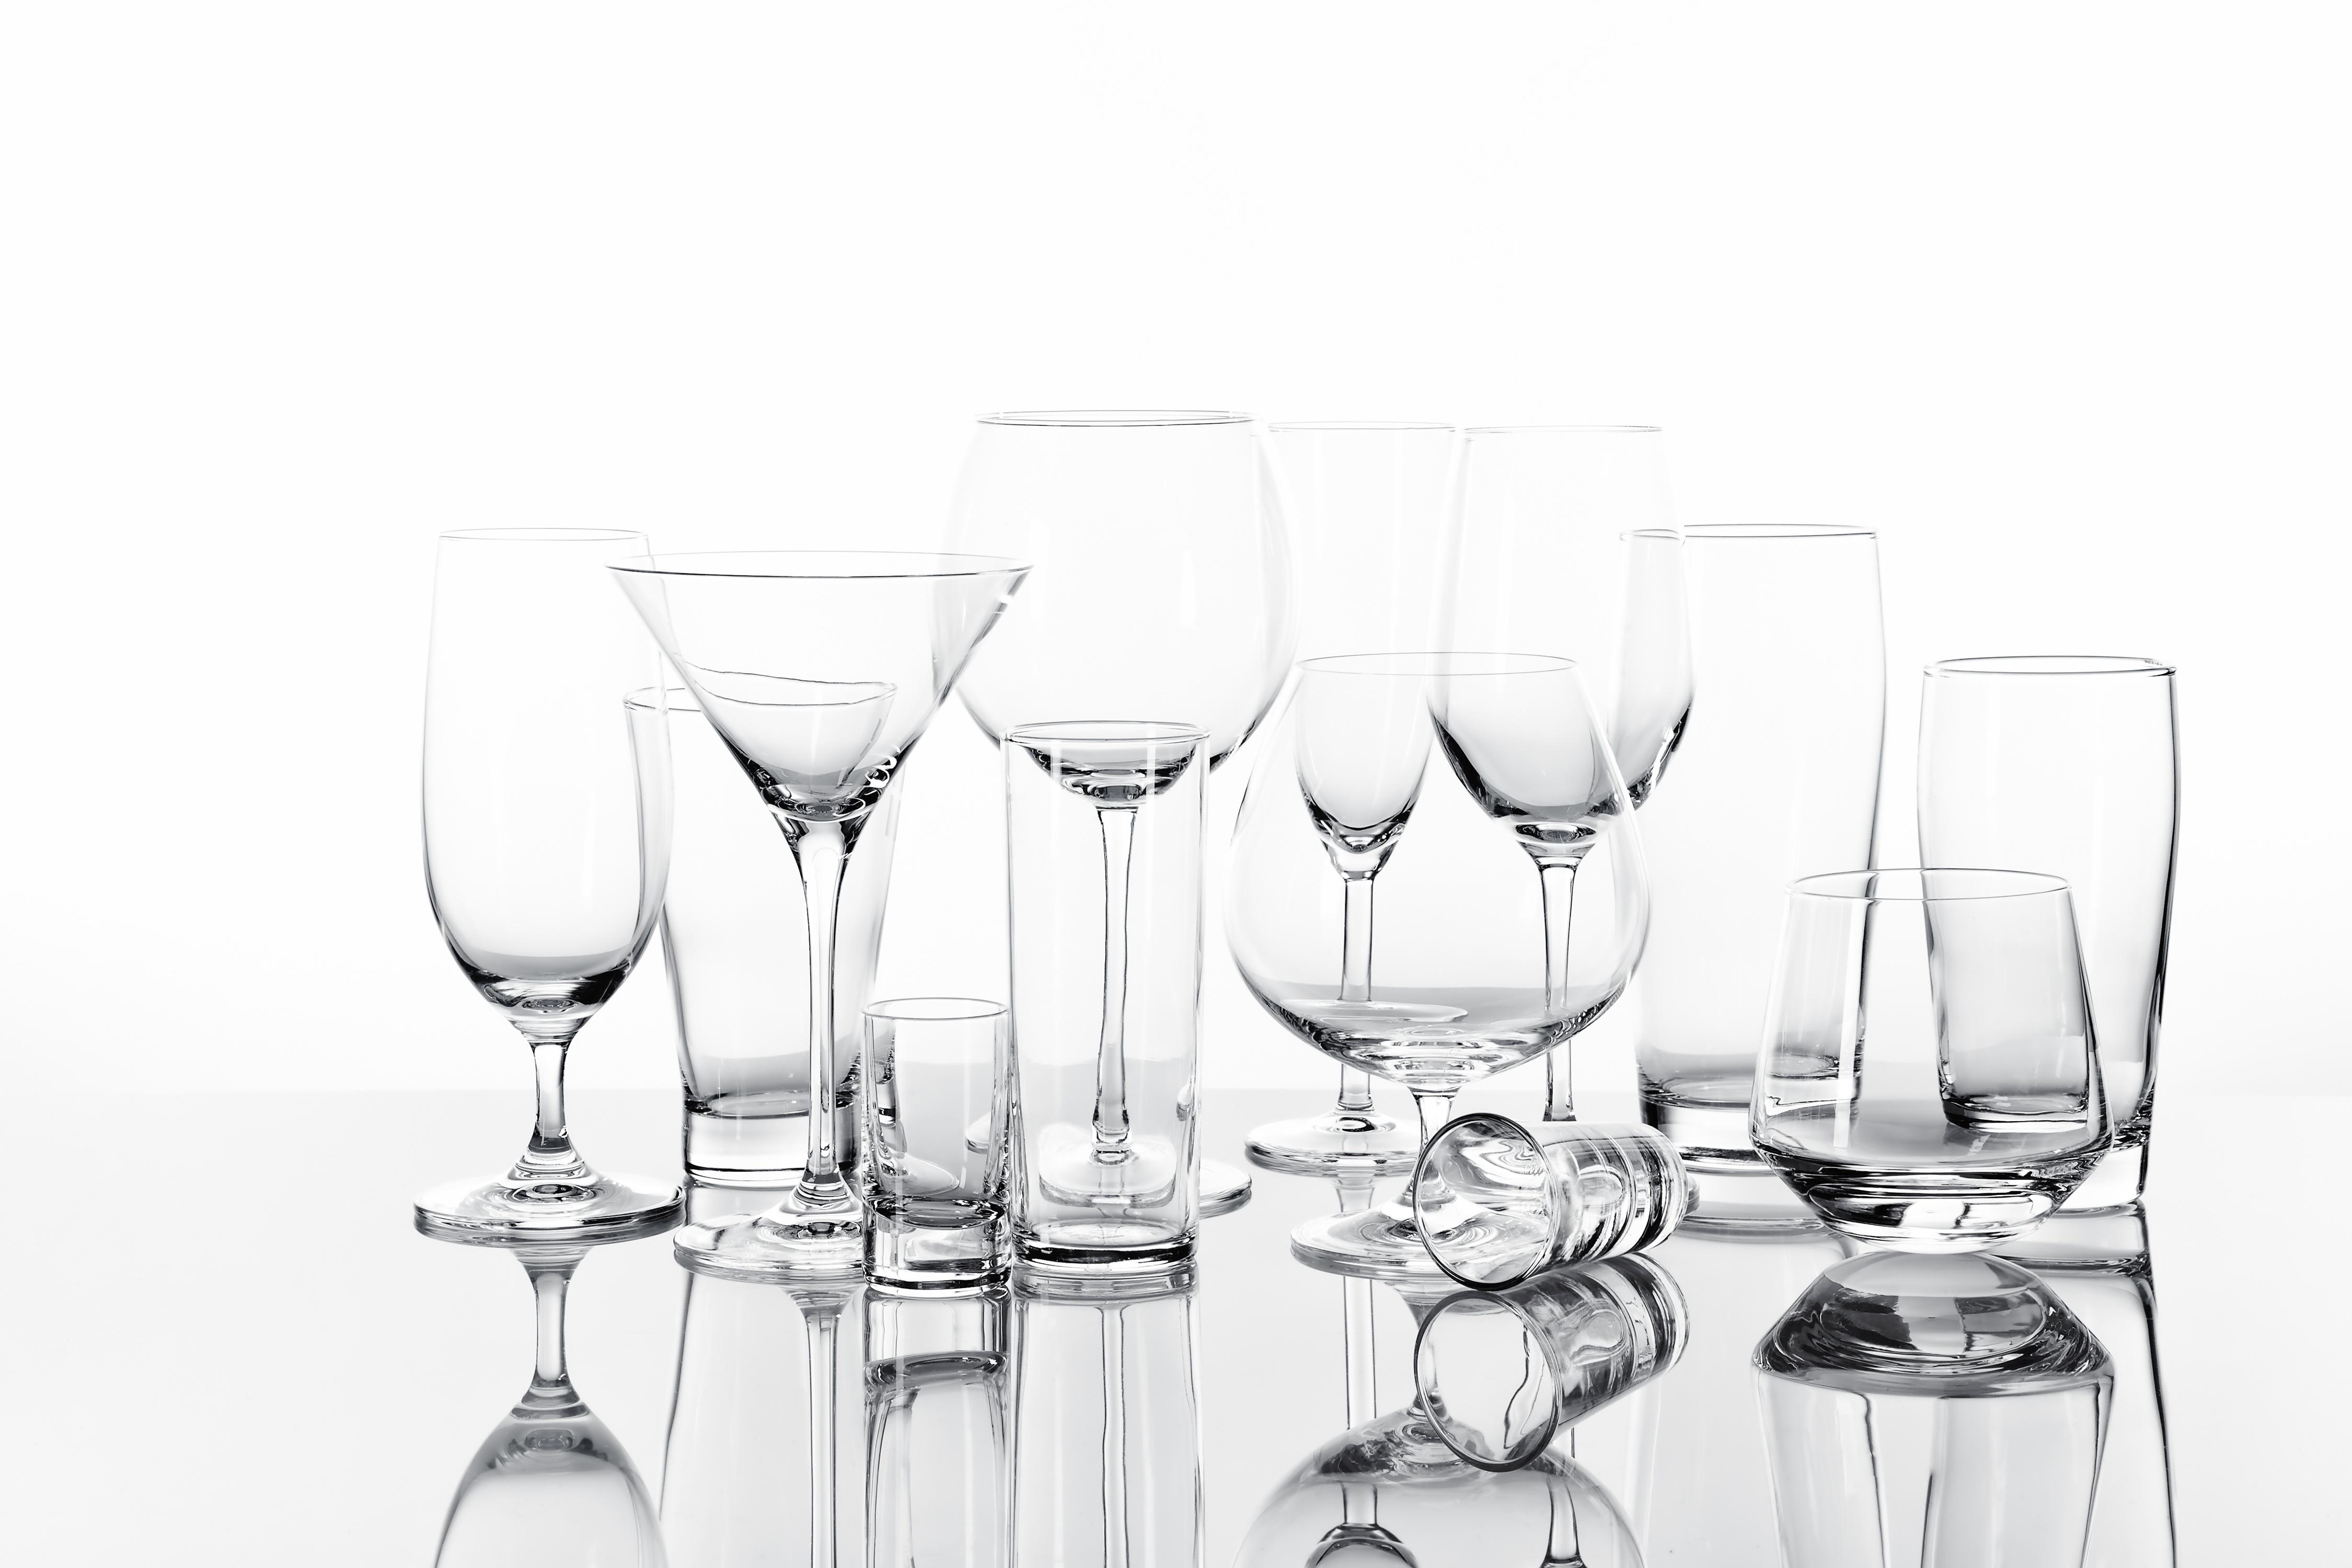 Shipping Glassware